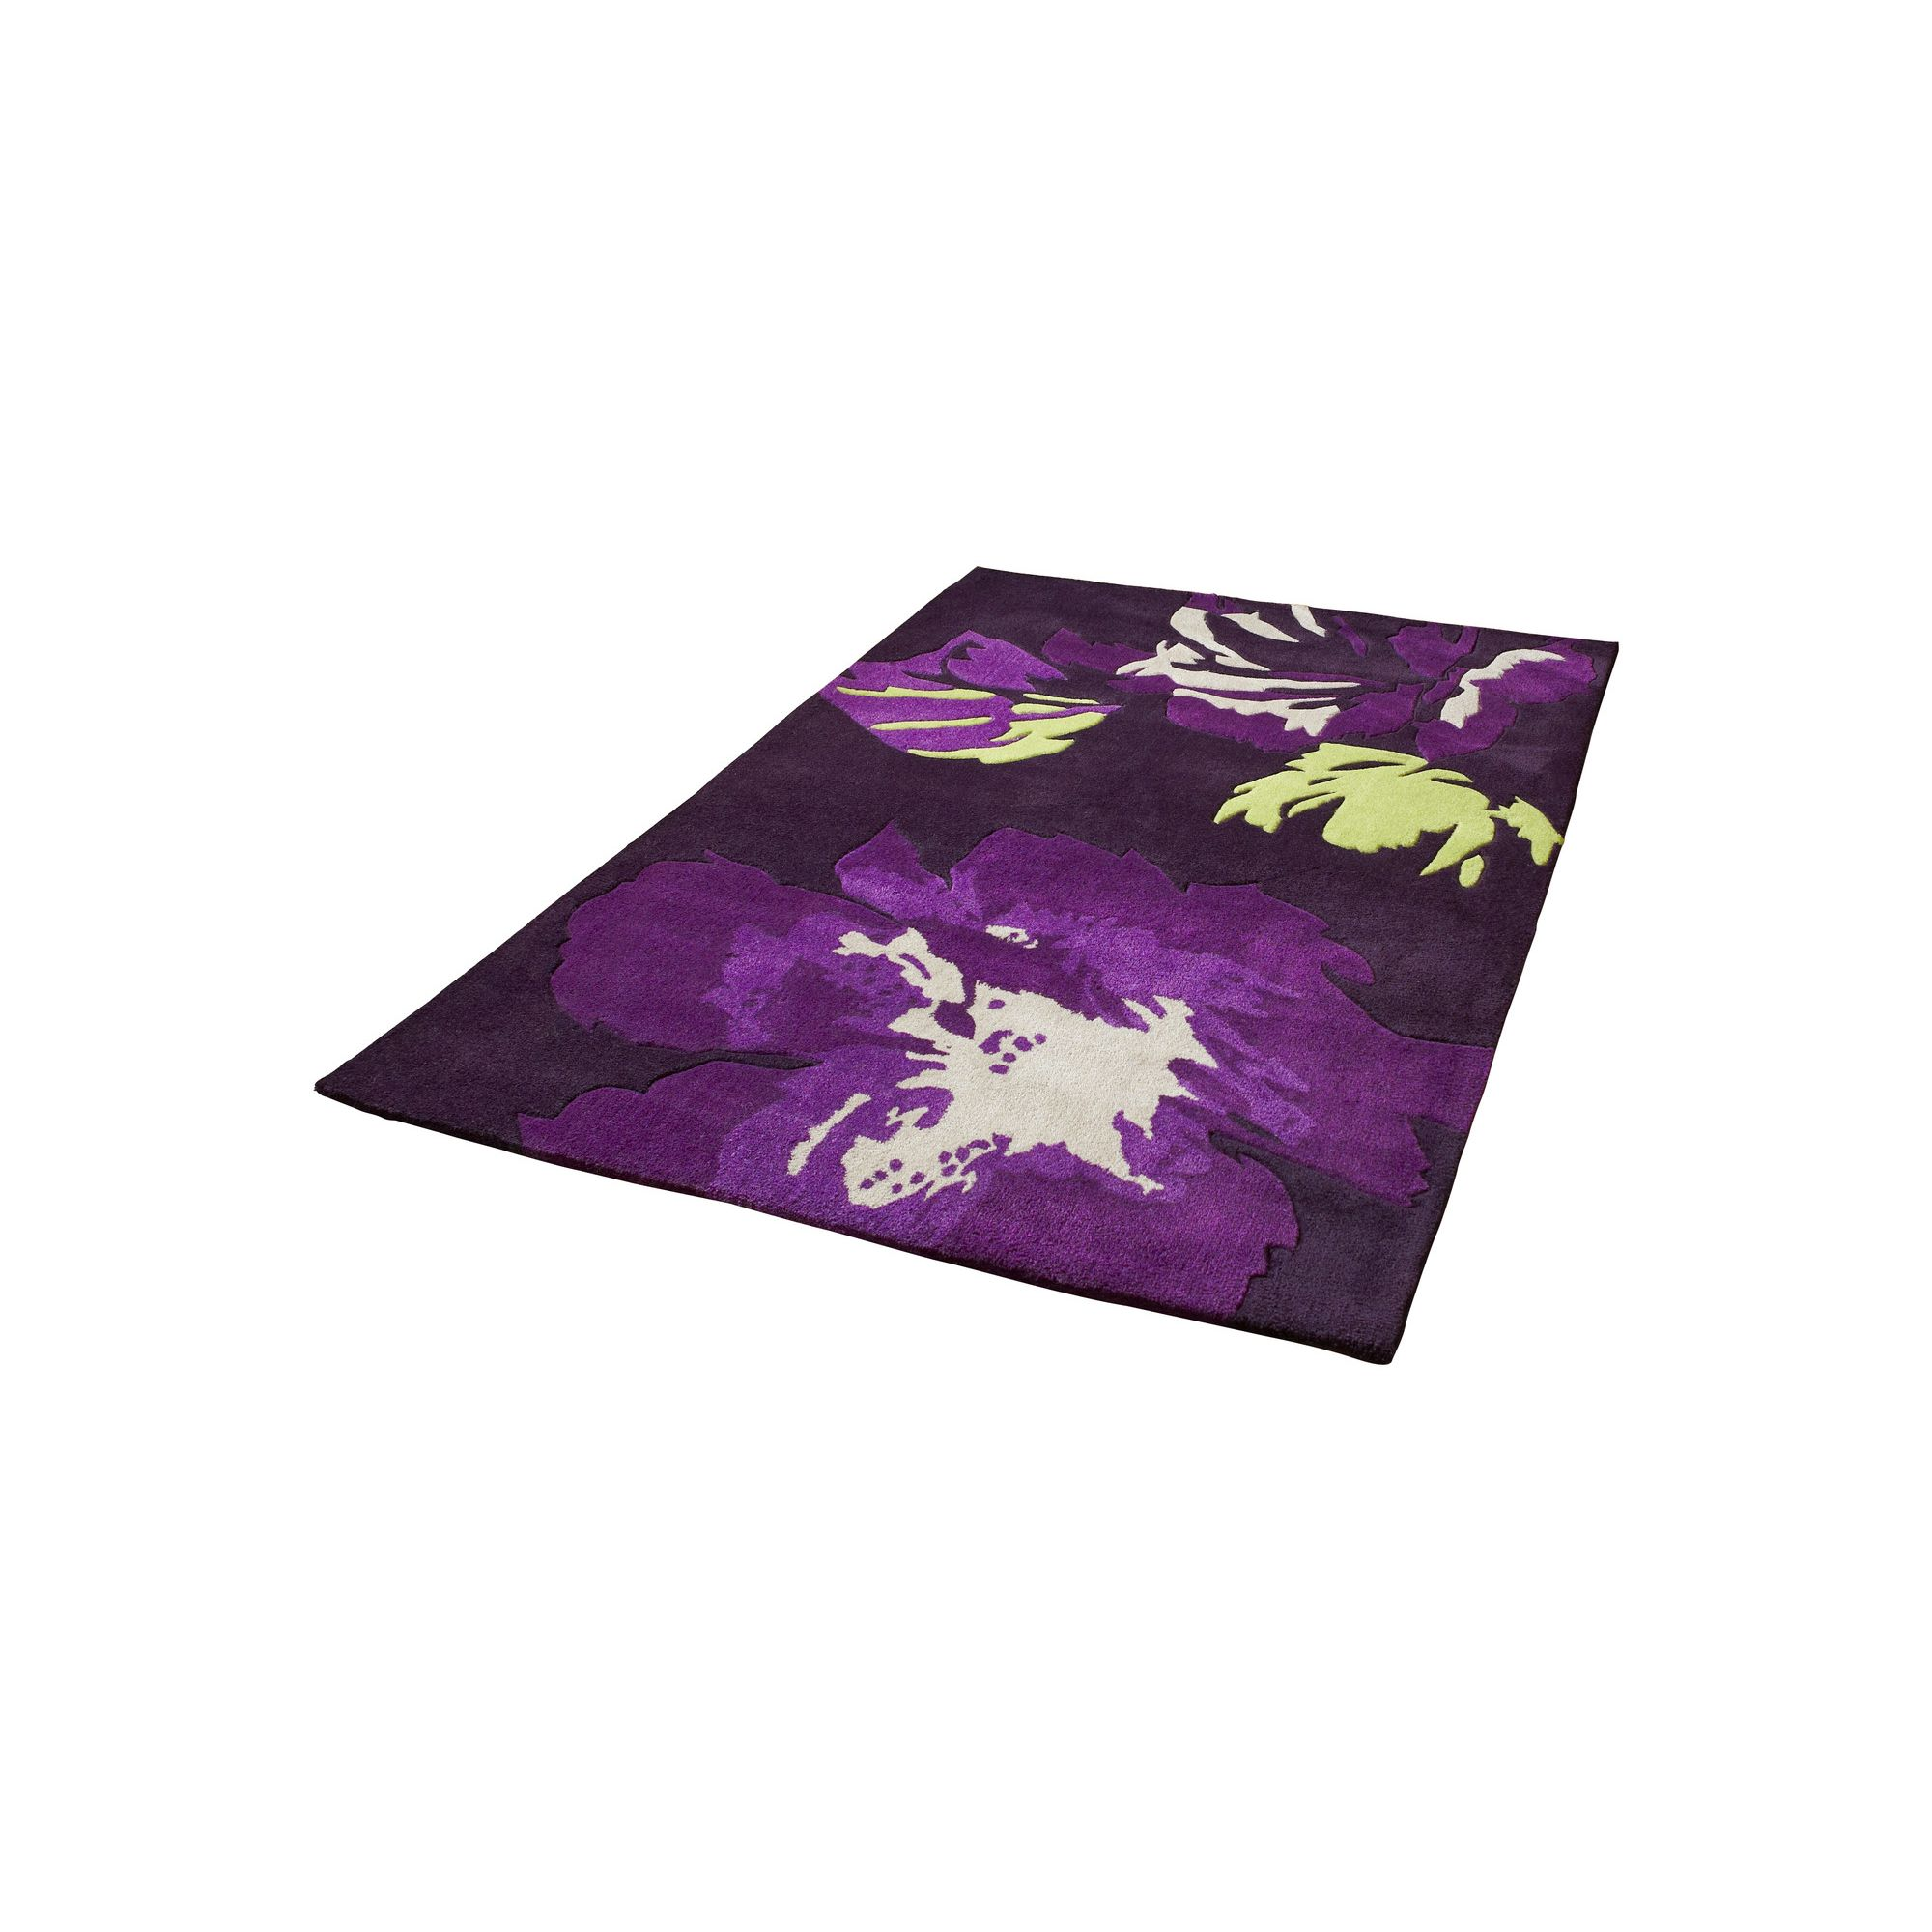 Oriental Carpets & Rugs Hong Kong 2827 Purple/Green Rug - 120cm x 170cm